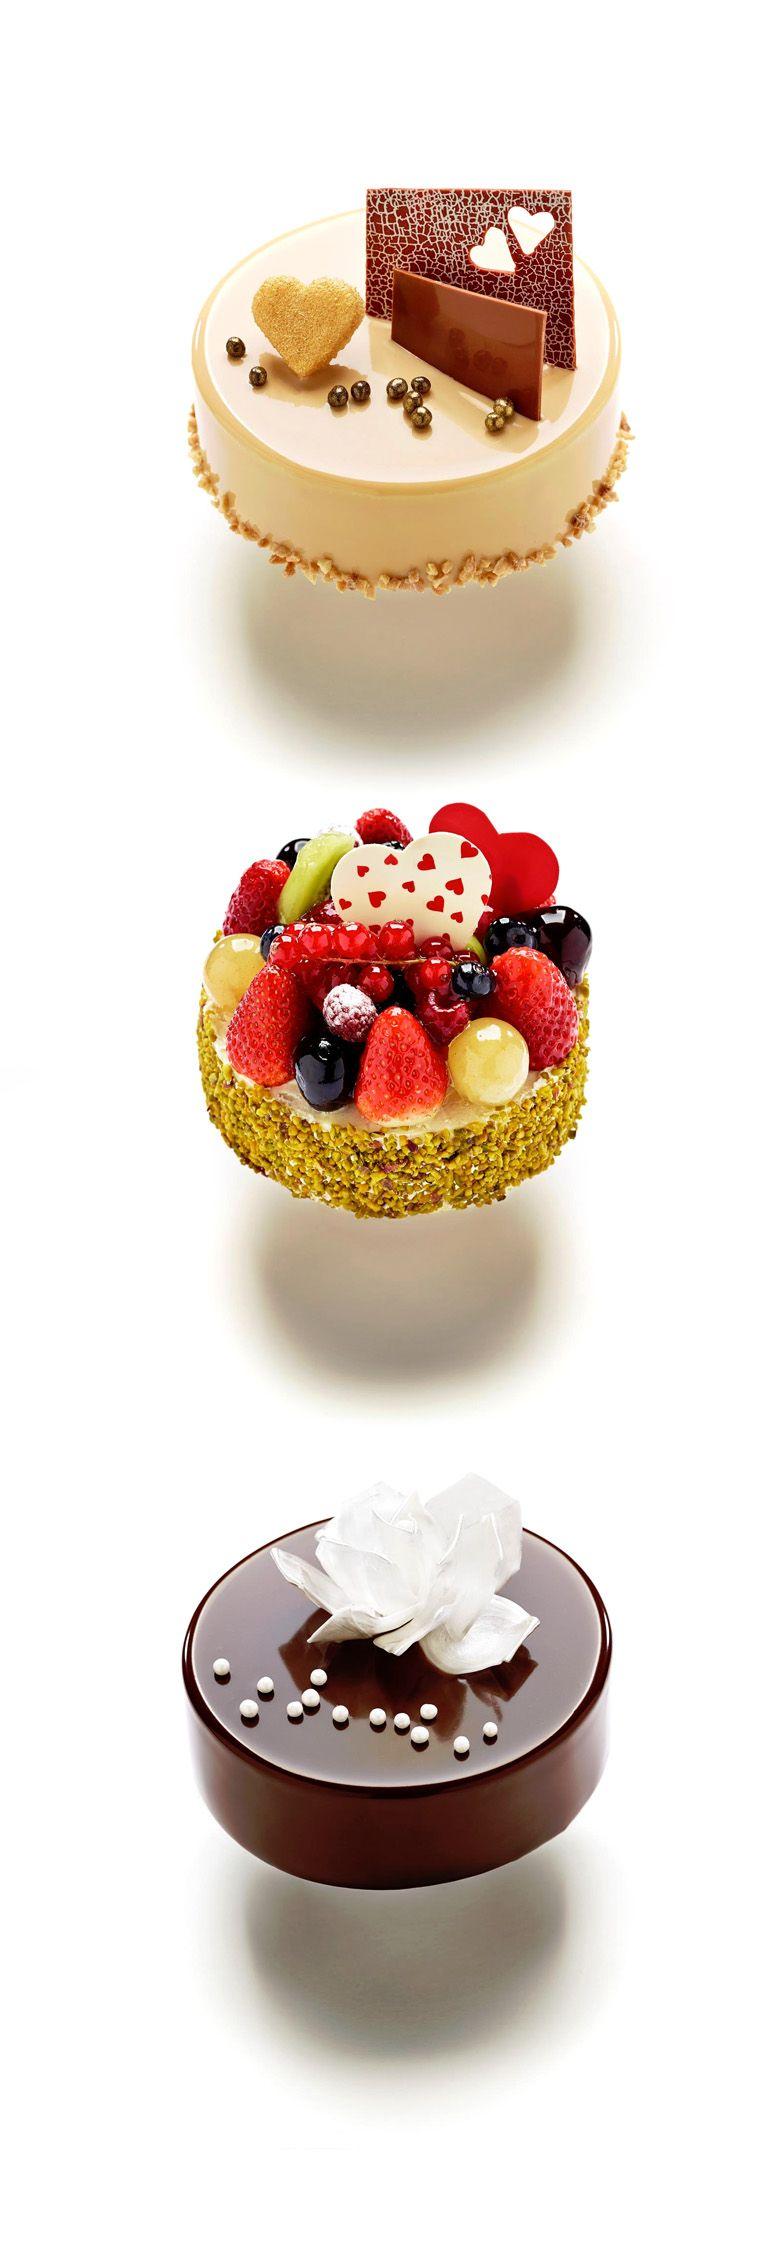 Coup De Foudre Et Gourmandises : foudre, gourmandises, Foudre, Tahiti, Sentimental, Maison, Wittamer, Fancy, Desserts,, Dessert, Recipes